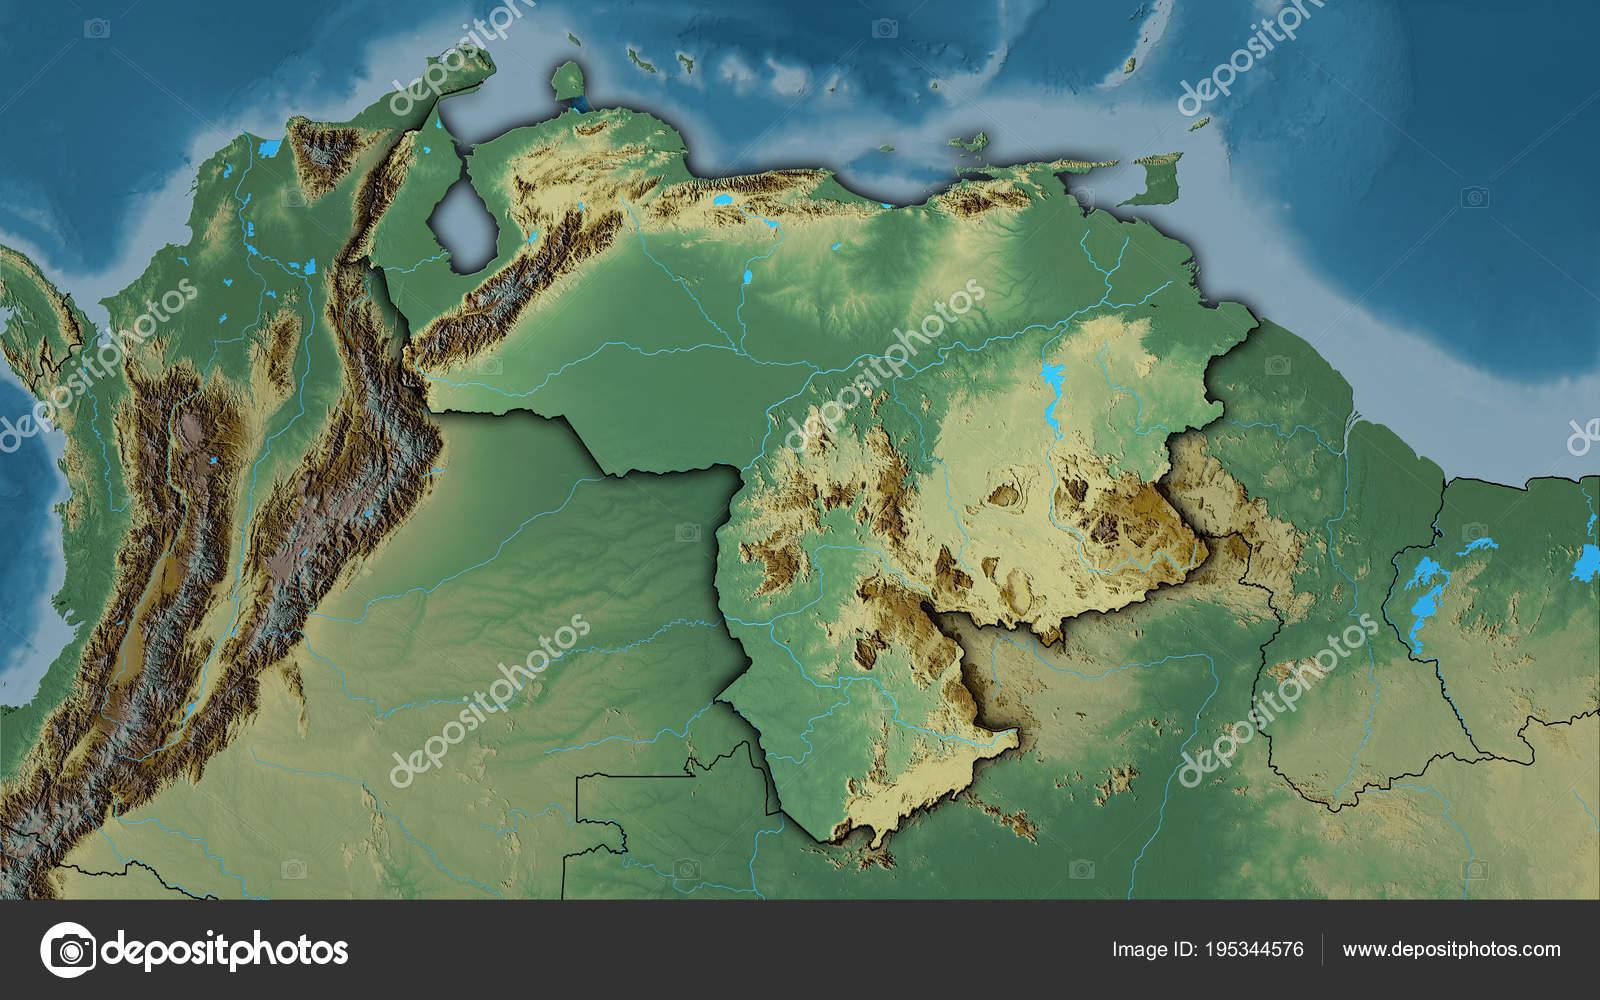 Venezuela Topographic Map.Venezuela Topographic Relief Dark Glow Stock Photo C Yarr65